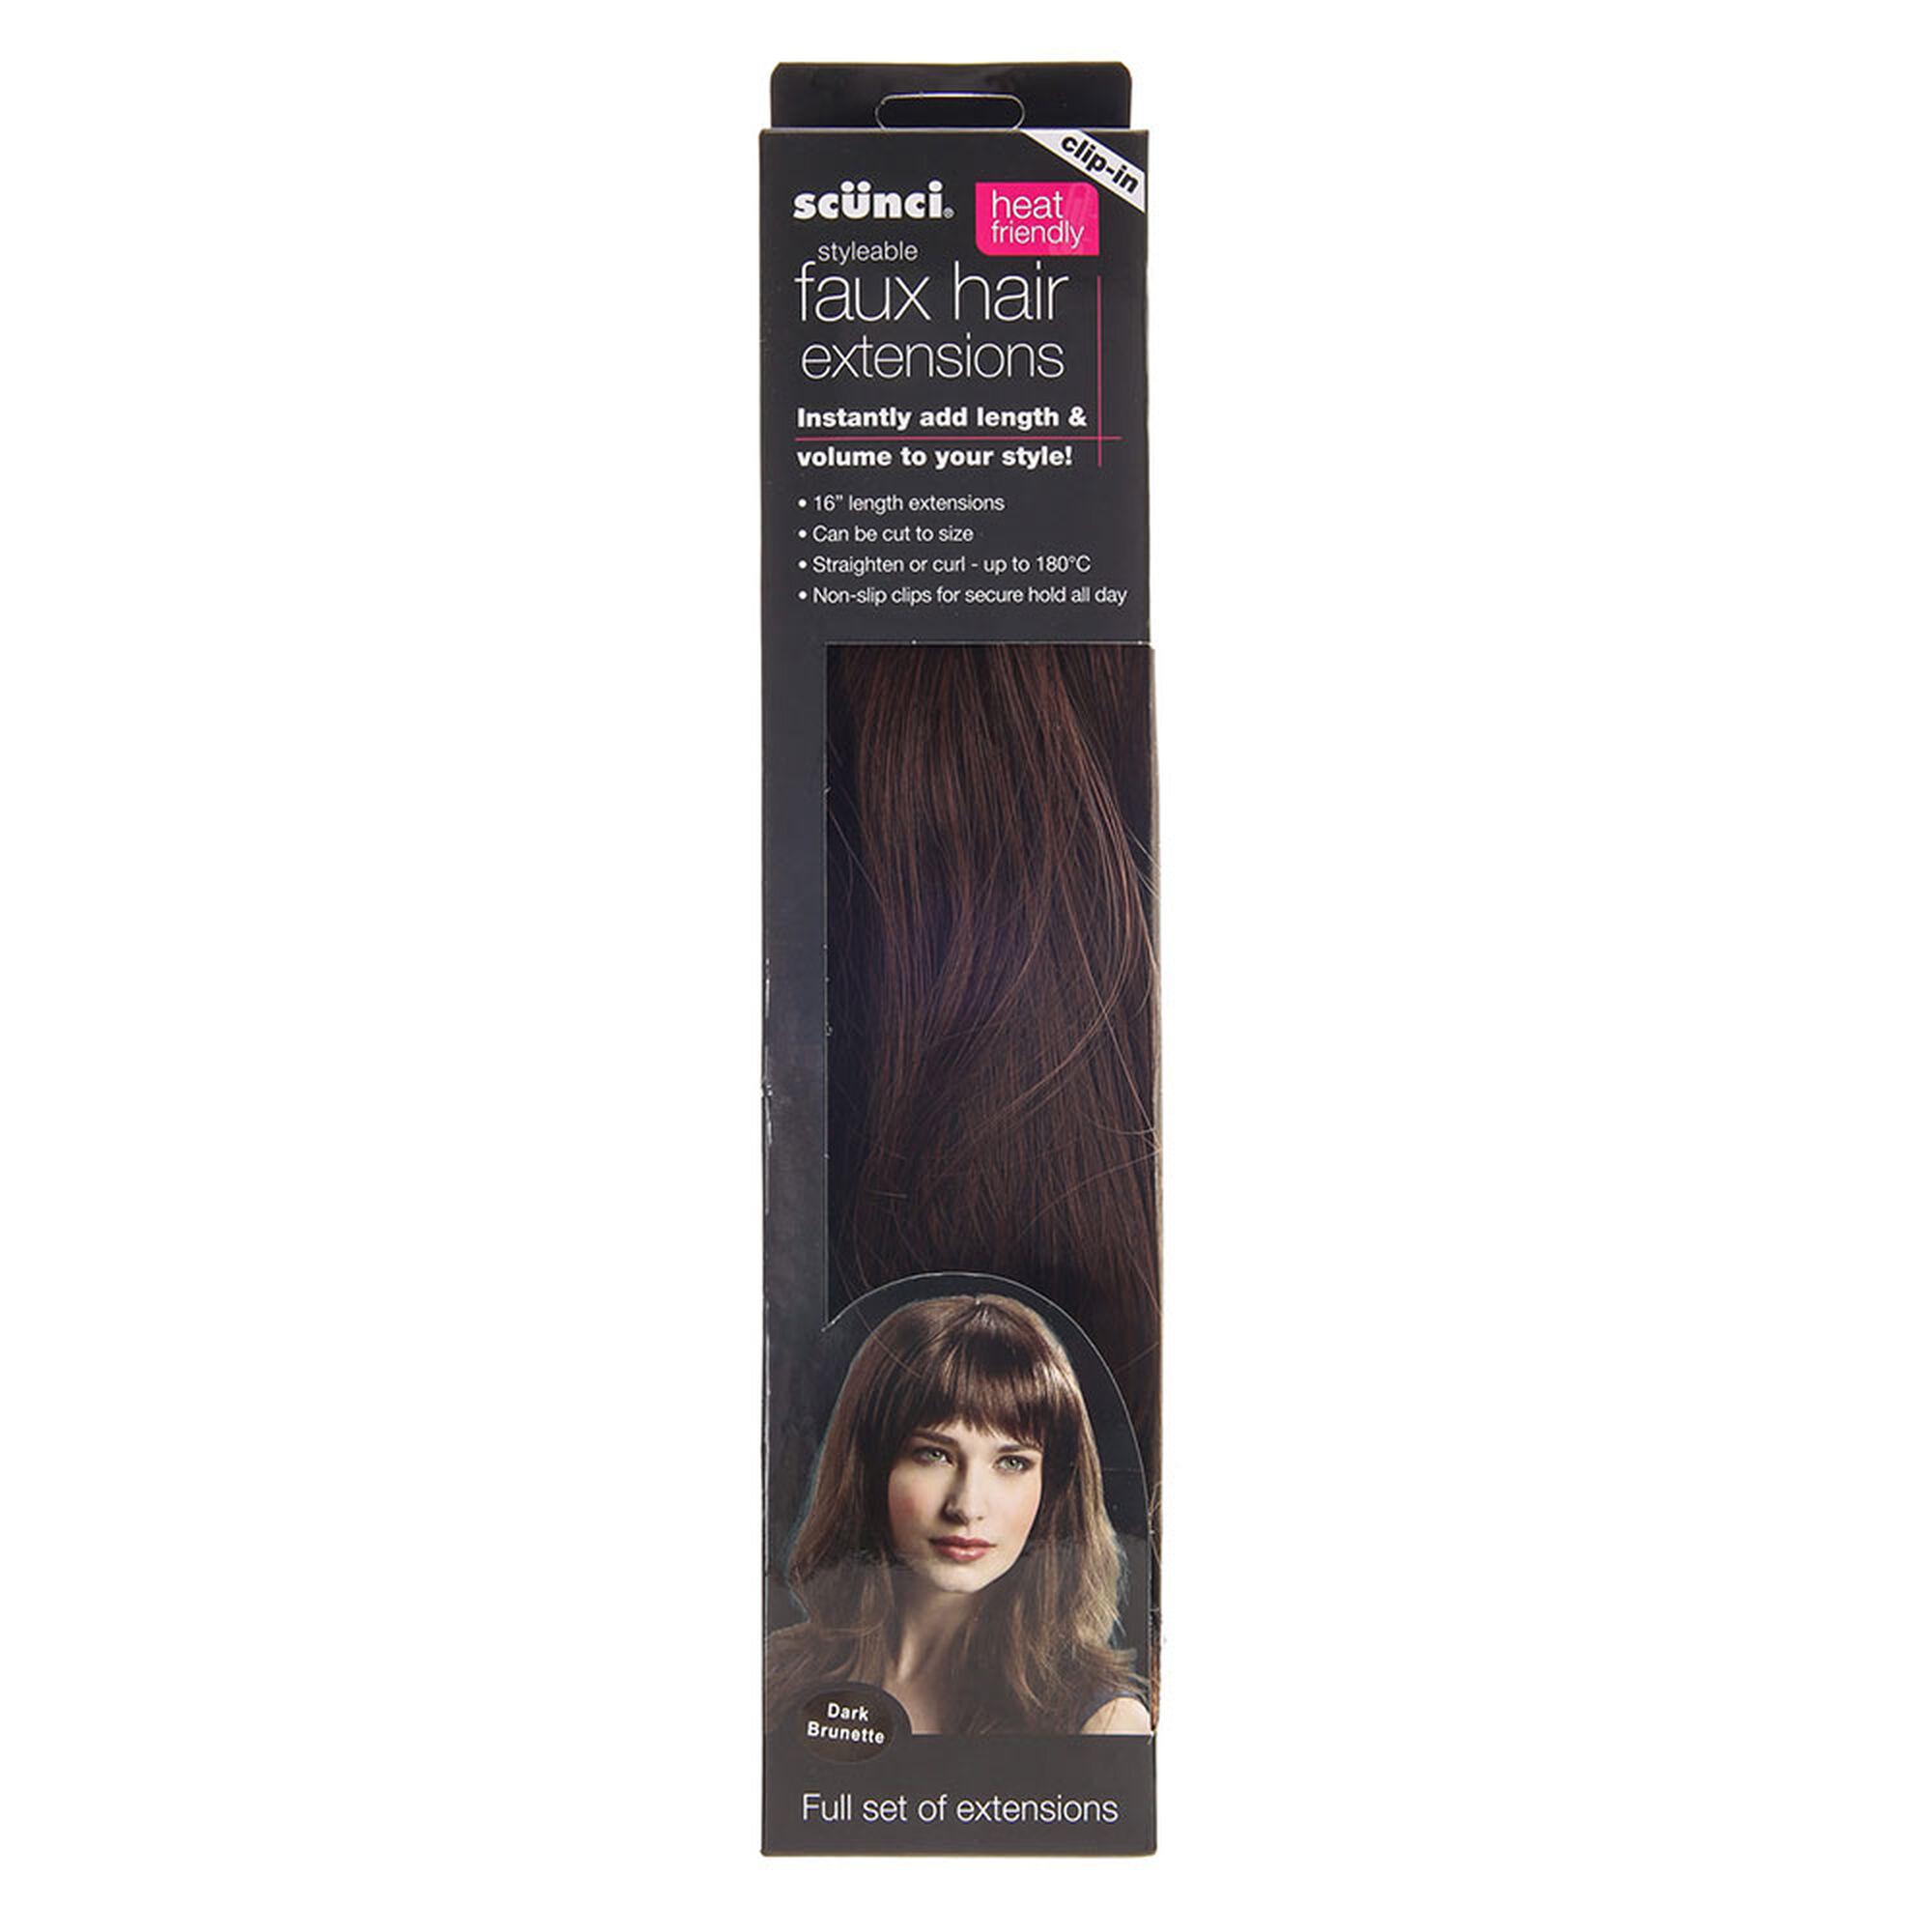 Scunci Dark Brown Faux Hair Extensions Claires